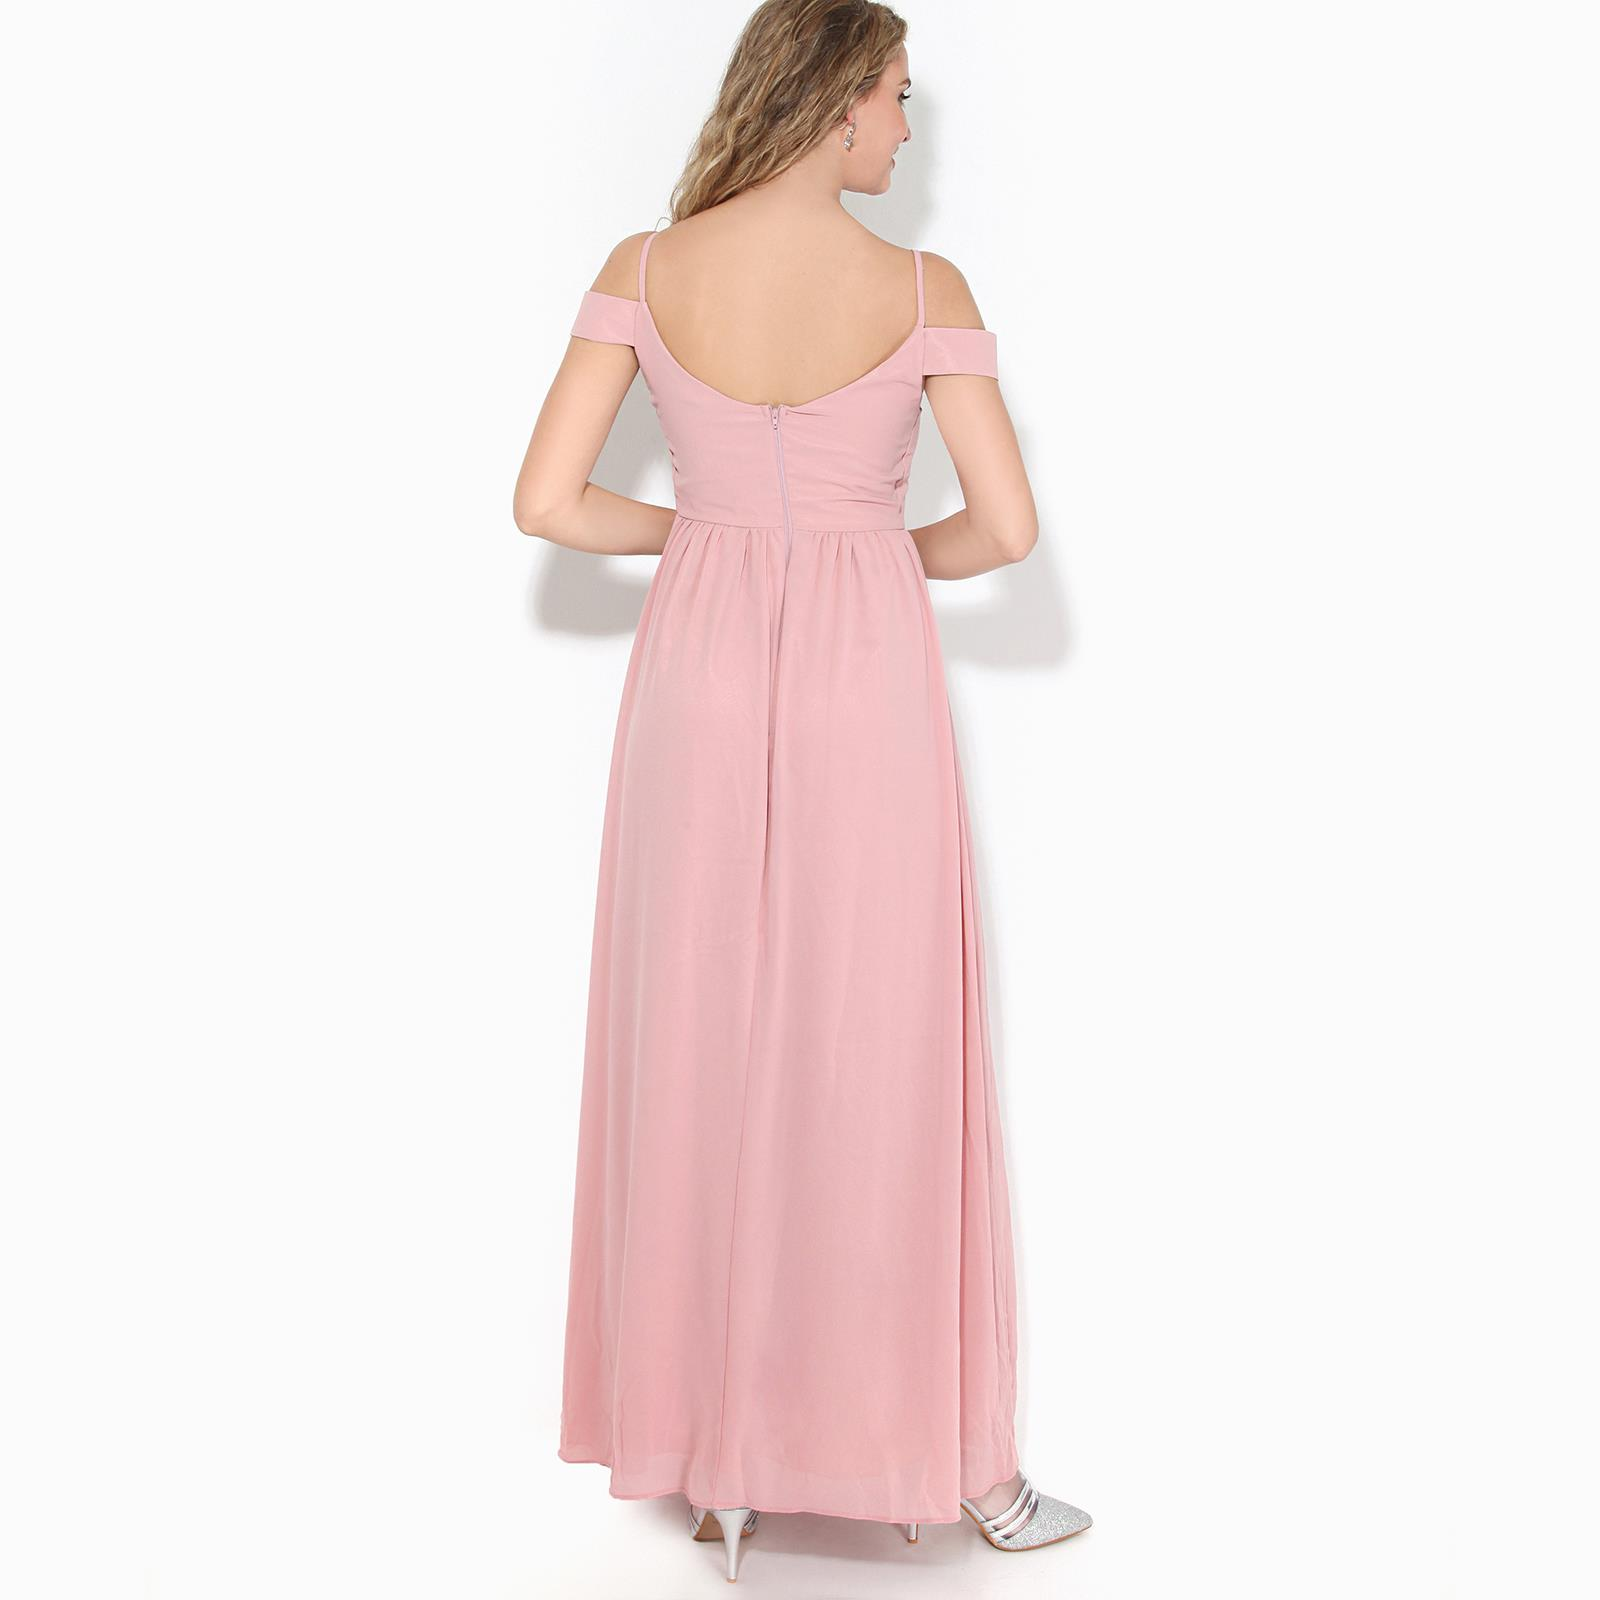 Womens-Ladies-Off-Shoulder-Formal-Maxi-Dress-Slit-Split-Long-Gown-Wedding-Party thumbnail 4